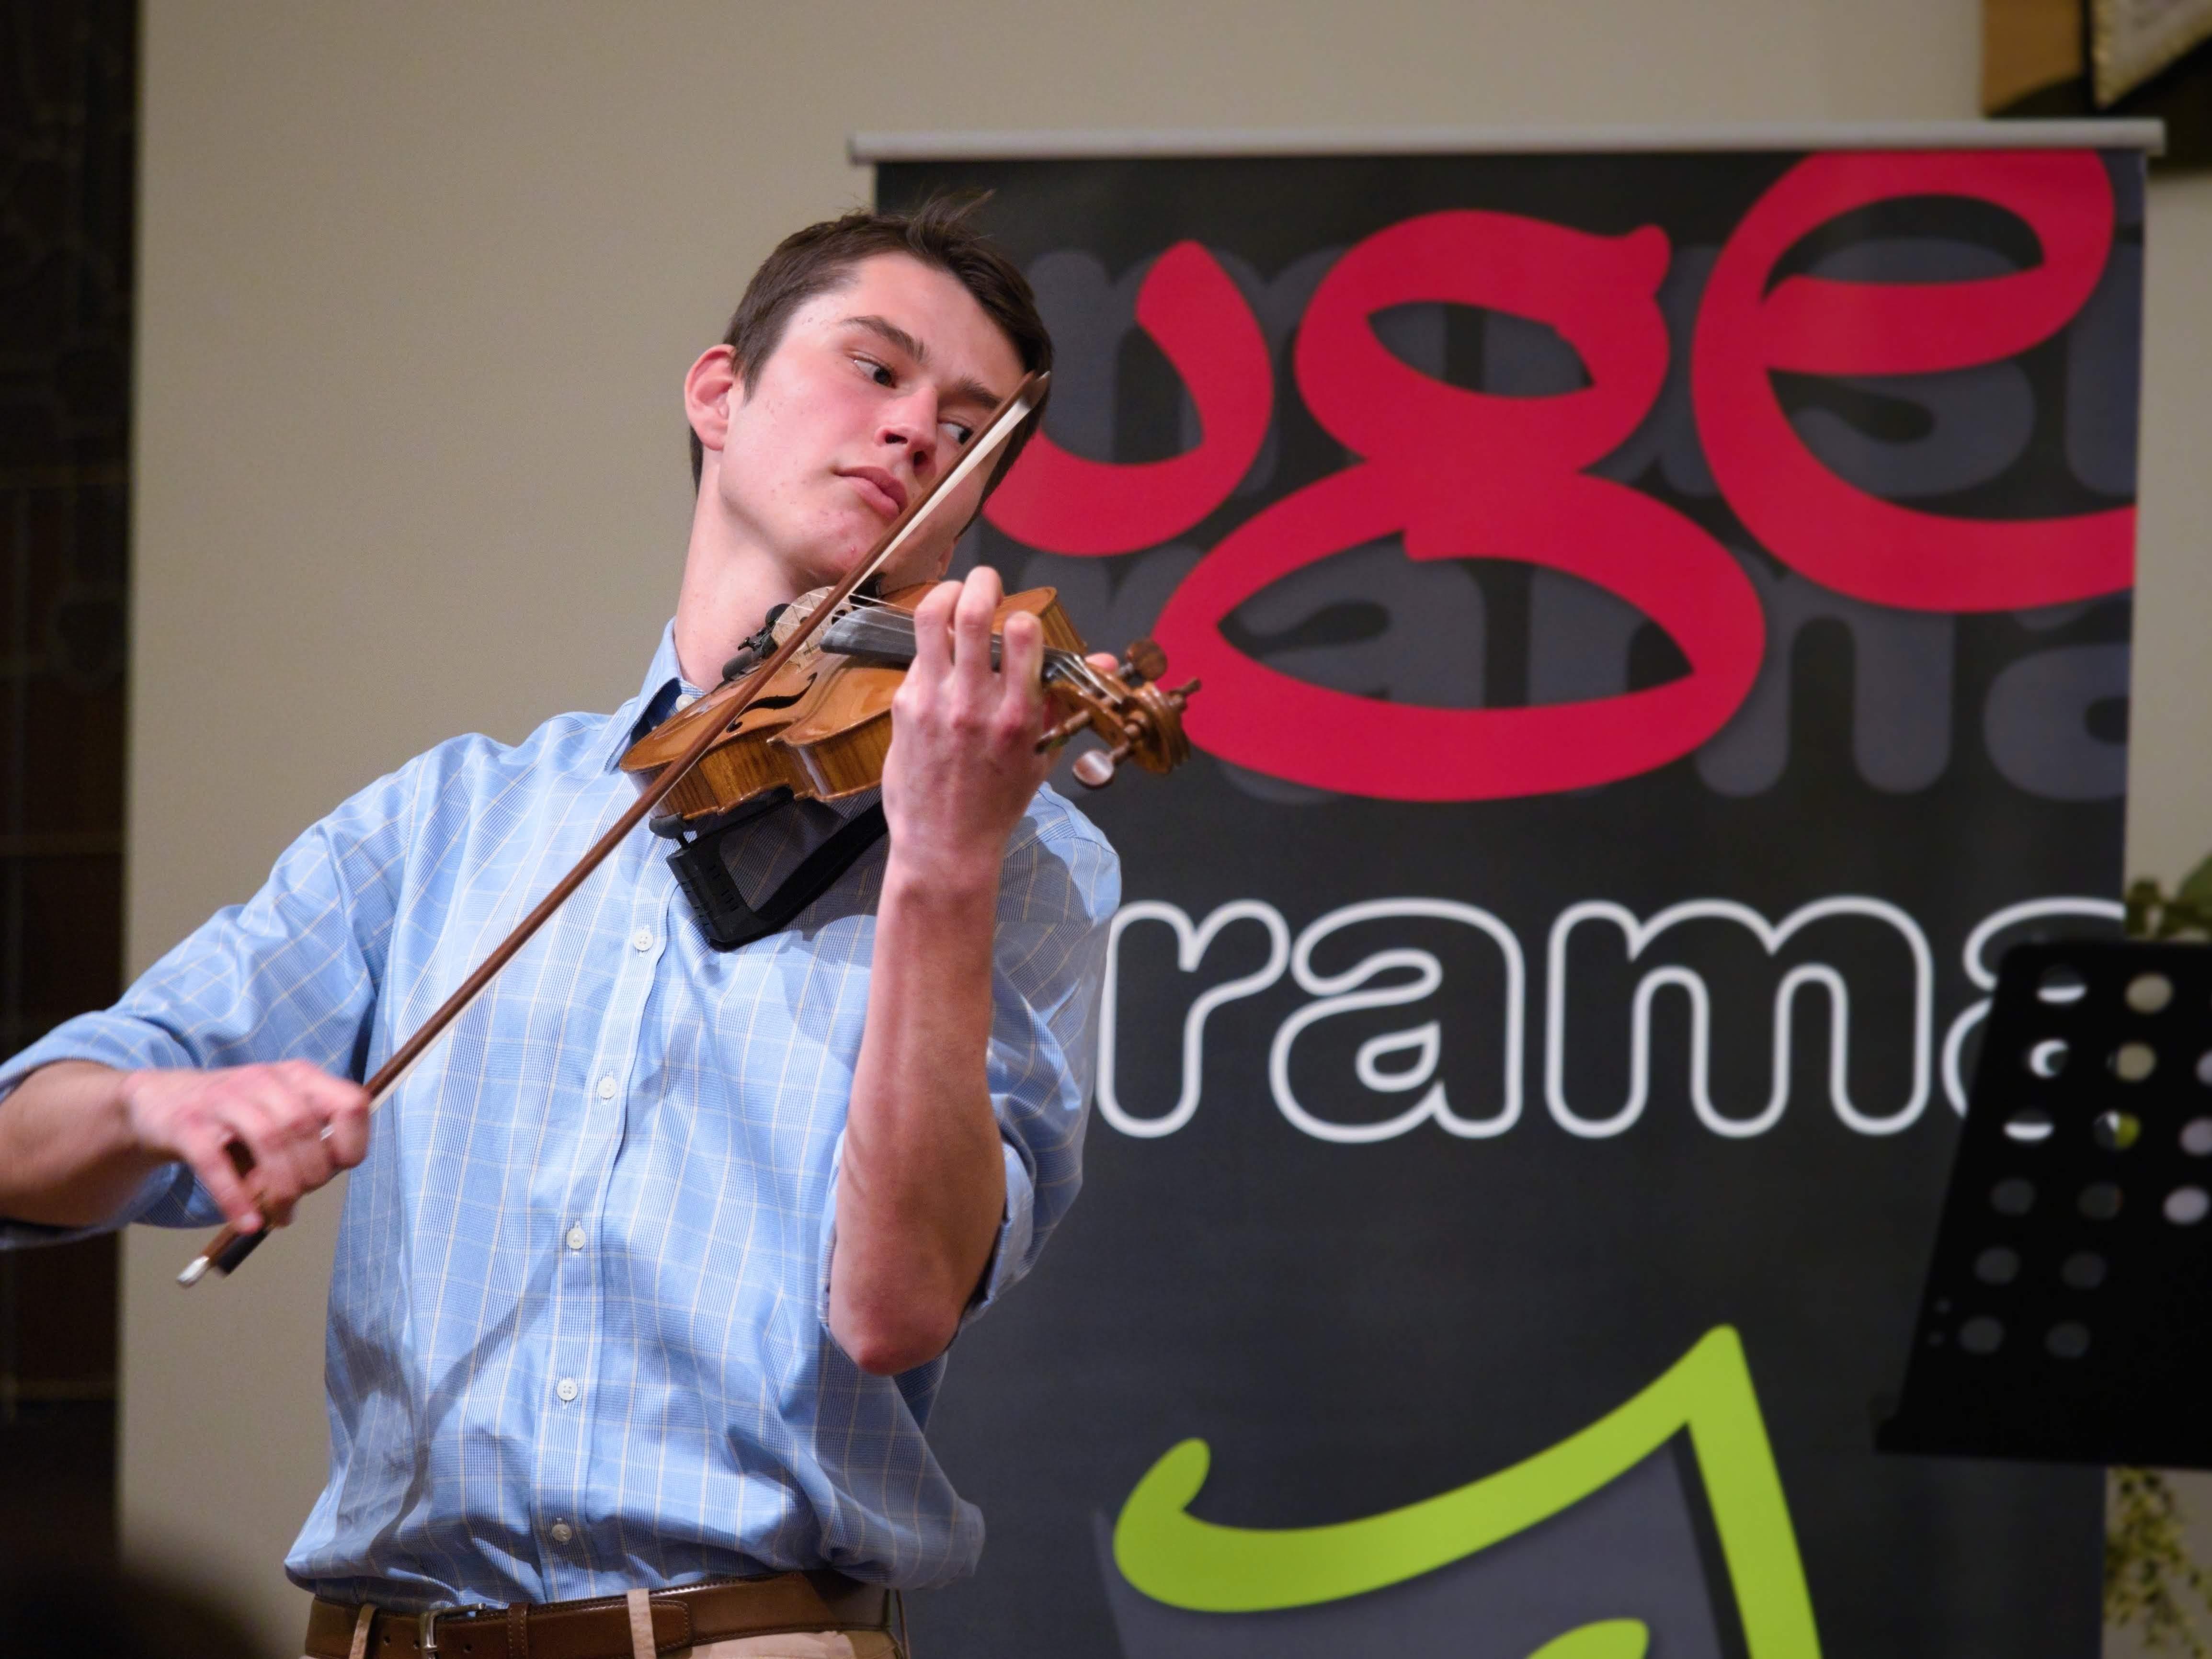 WGE Instrumental Timothy Valette Permorms on the Violin